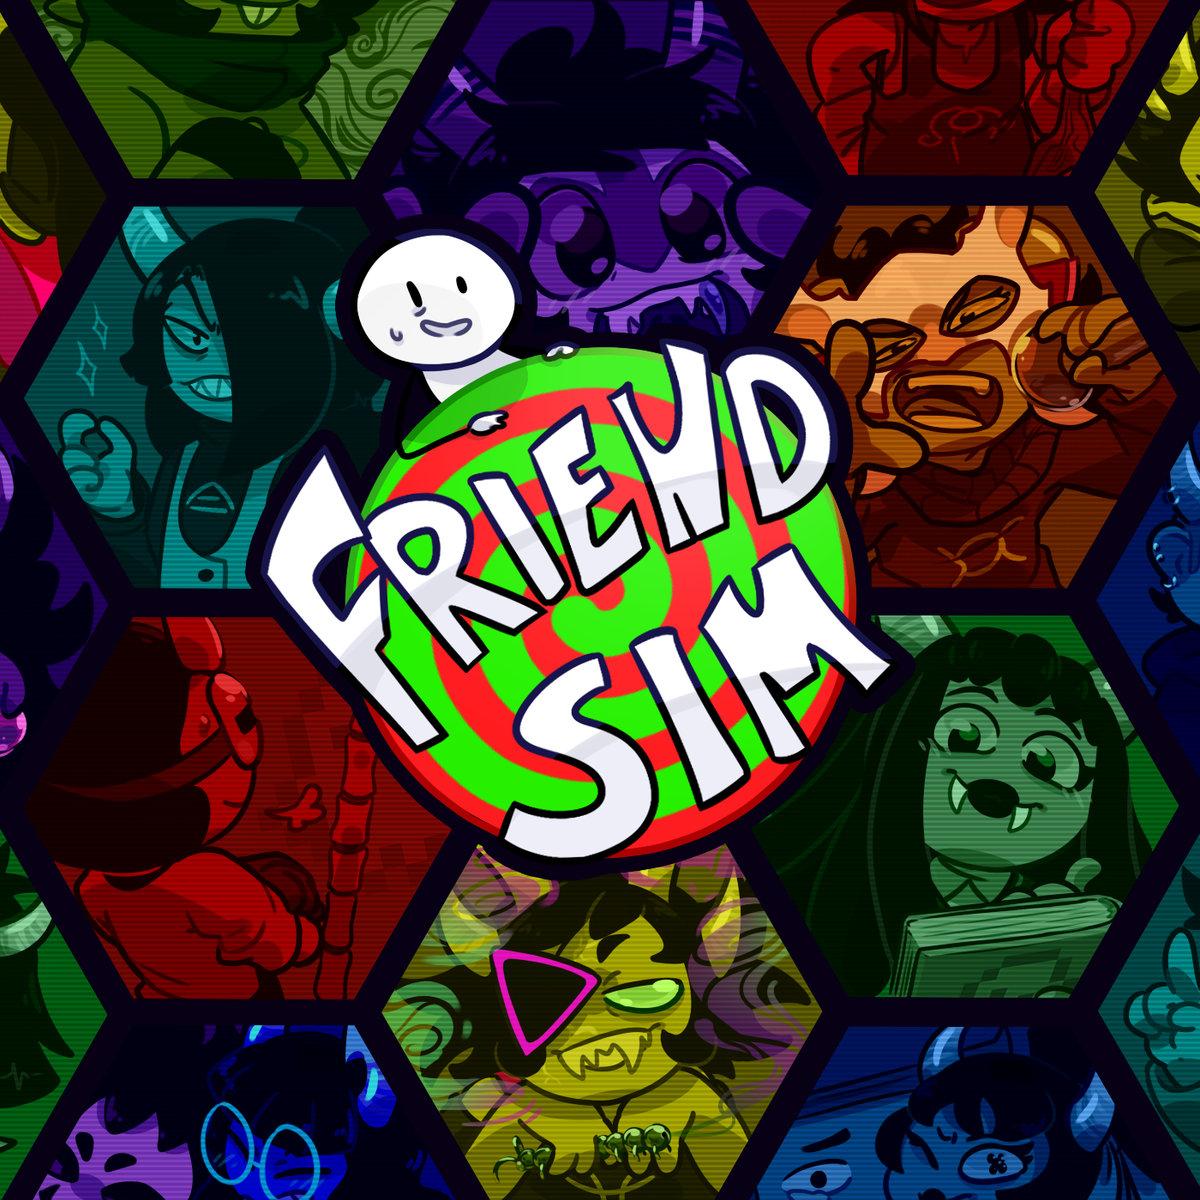 Hiveswap Friendship Simulator Music Ms Paint Adventures Wiki